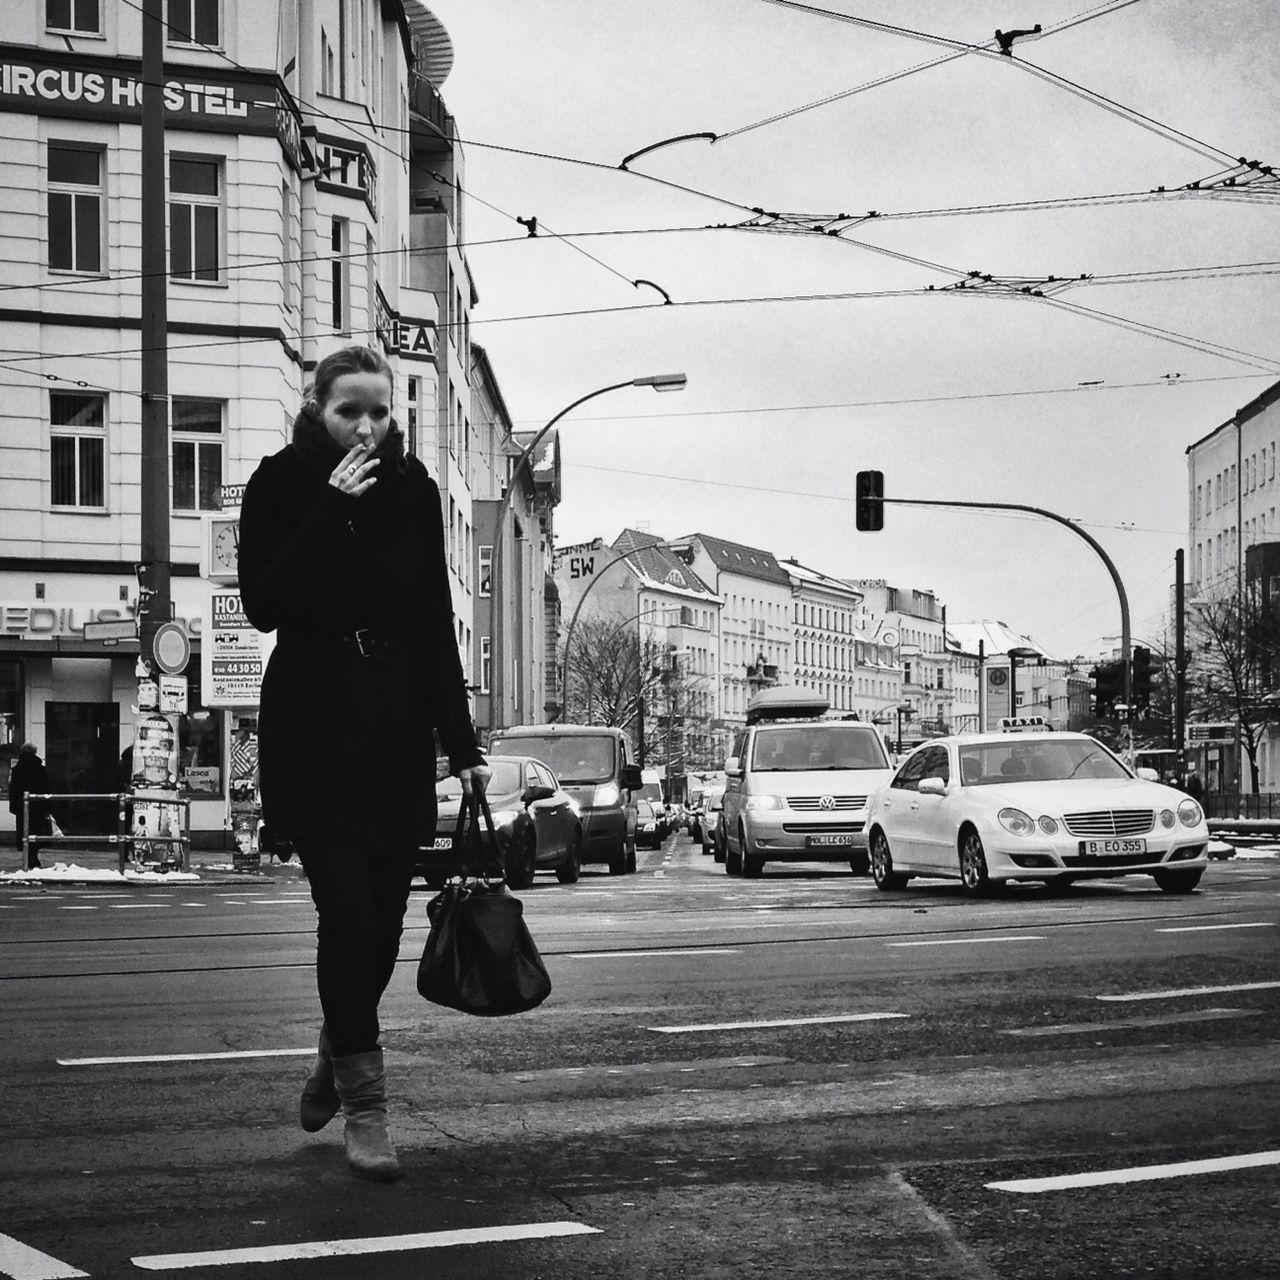 WOMAN WALKING ON CITY STREET AGAINST SKY